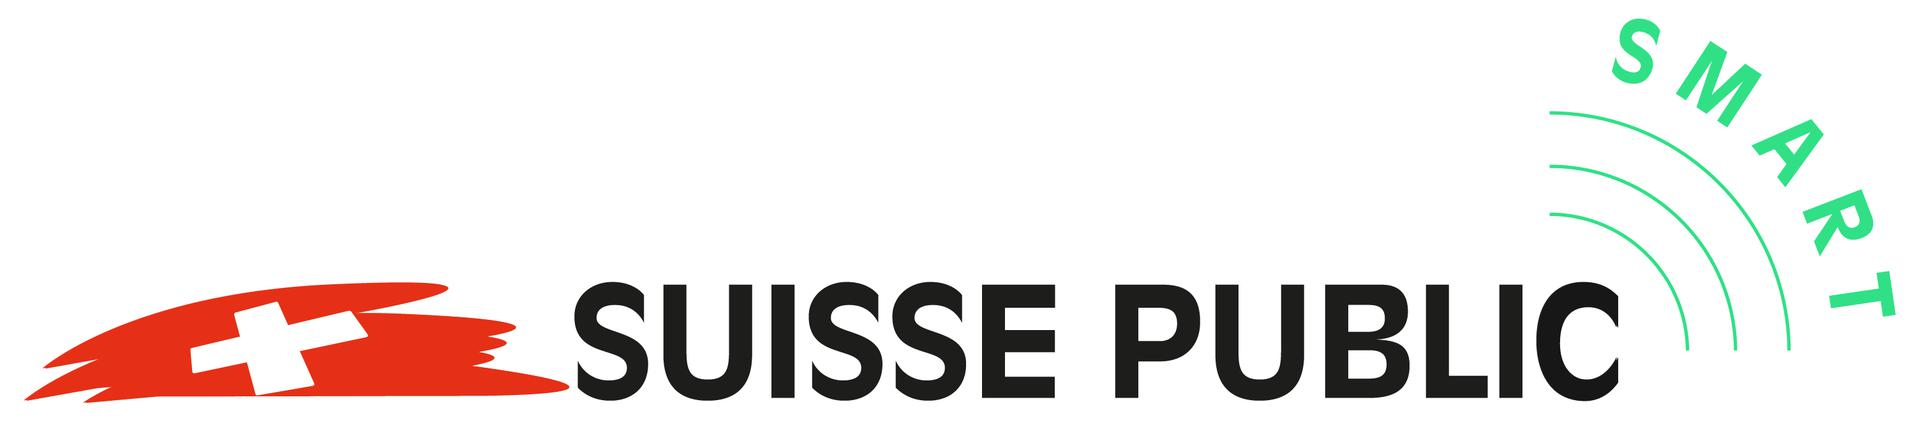 suissepublicsmart